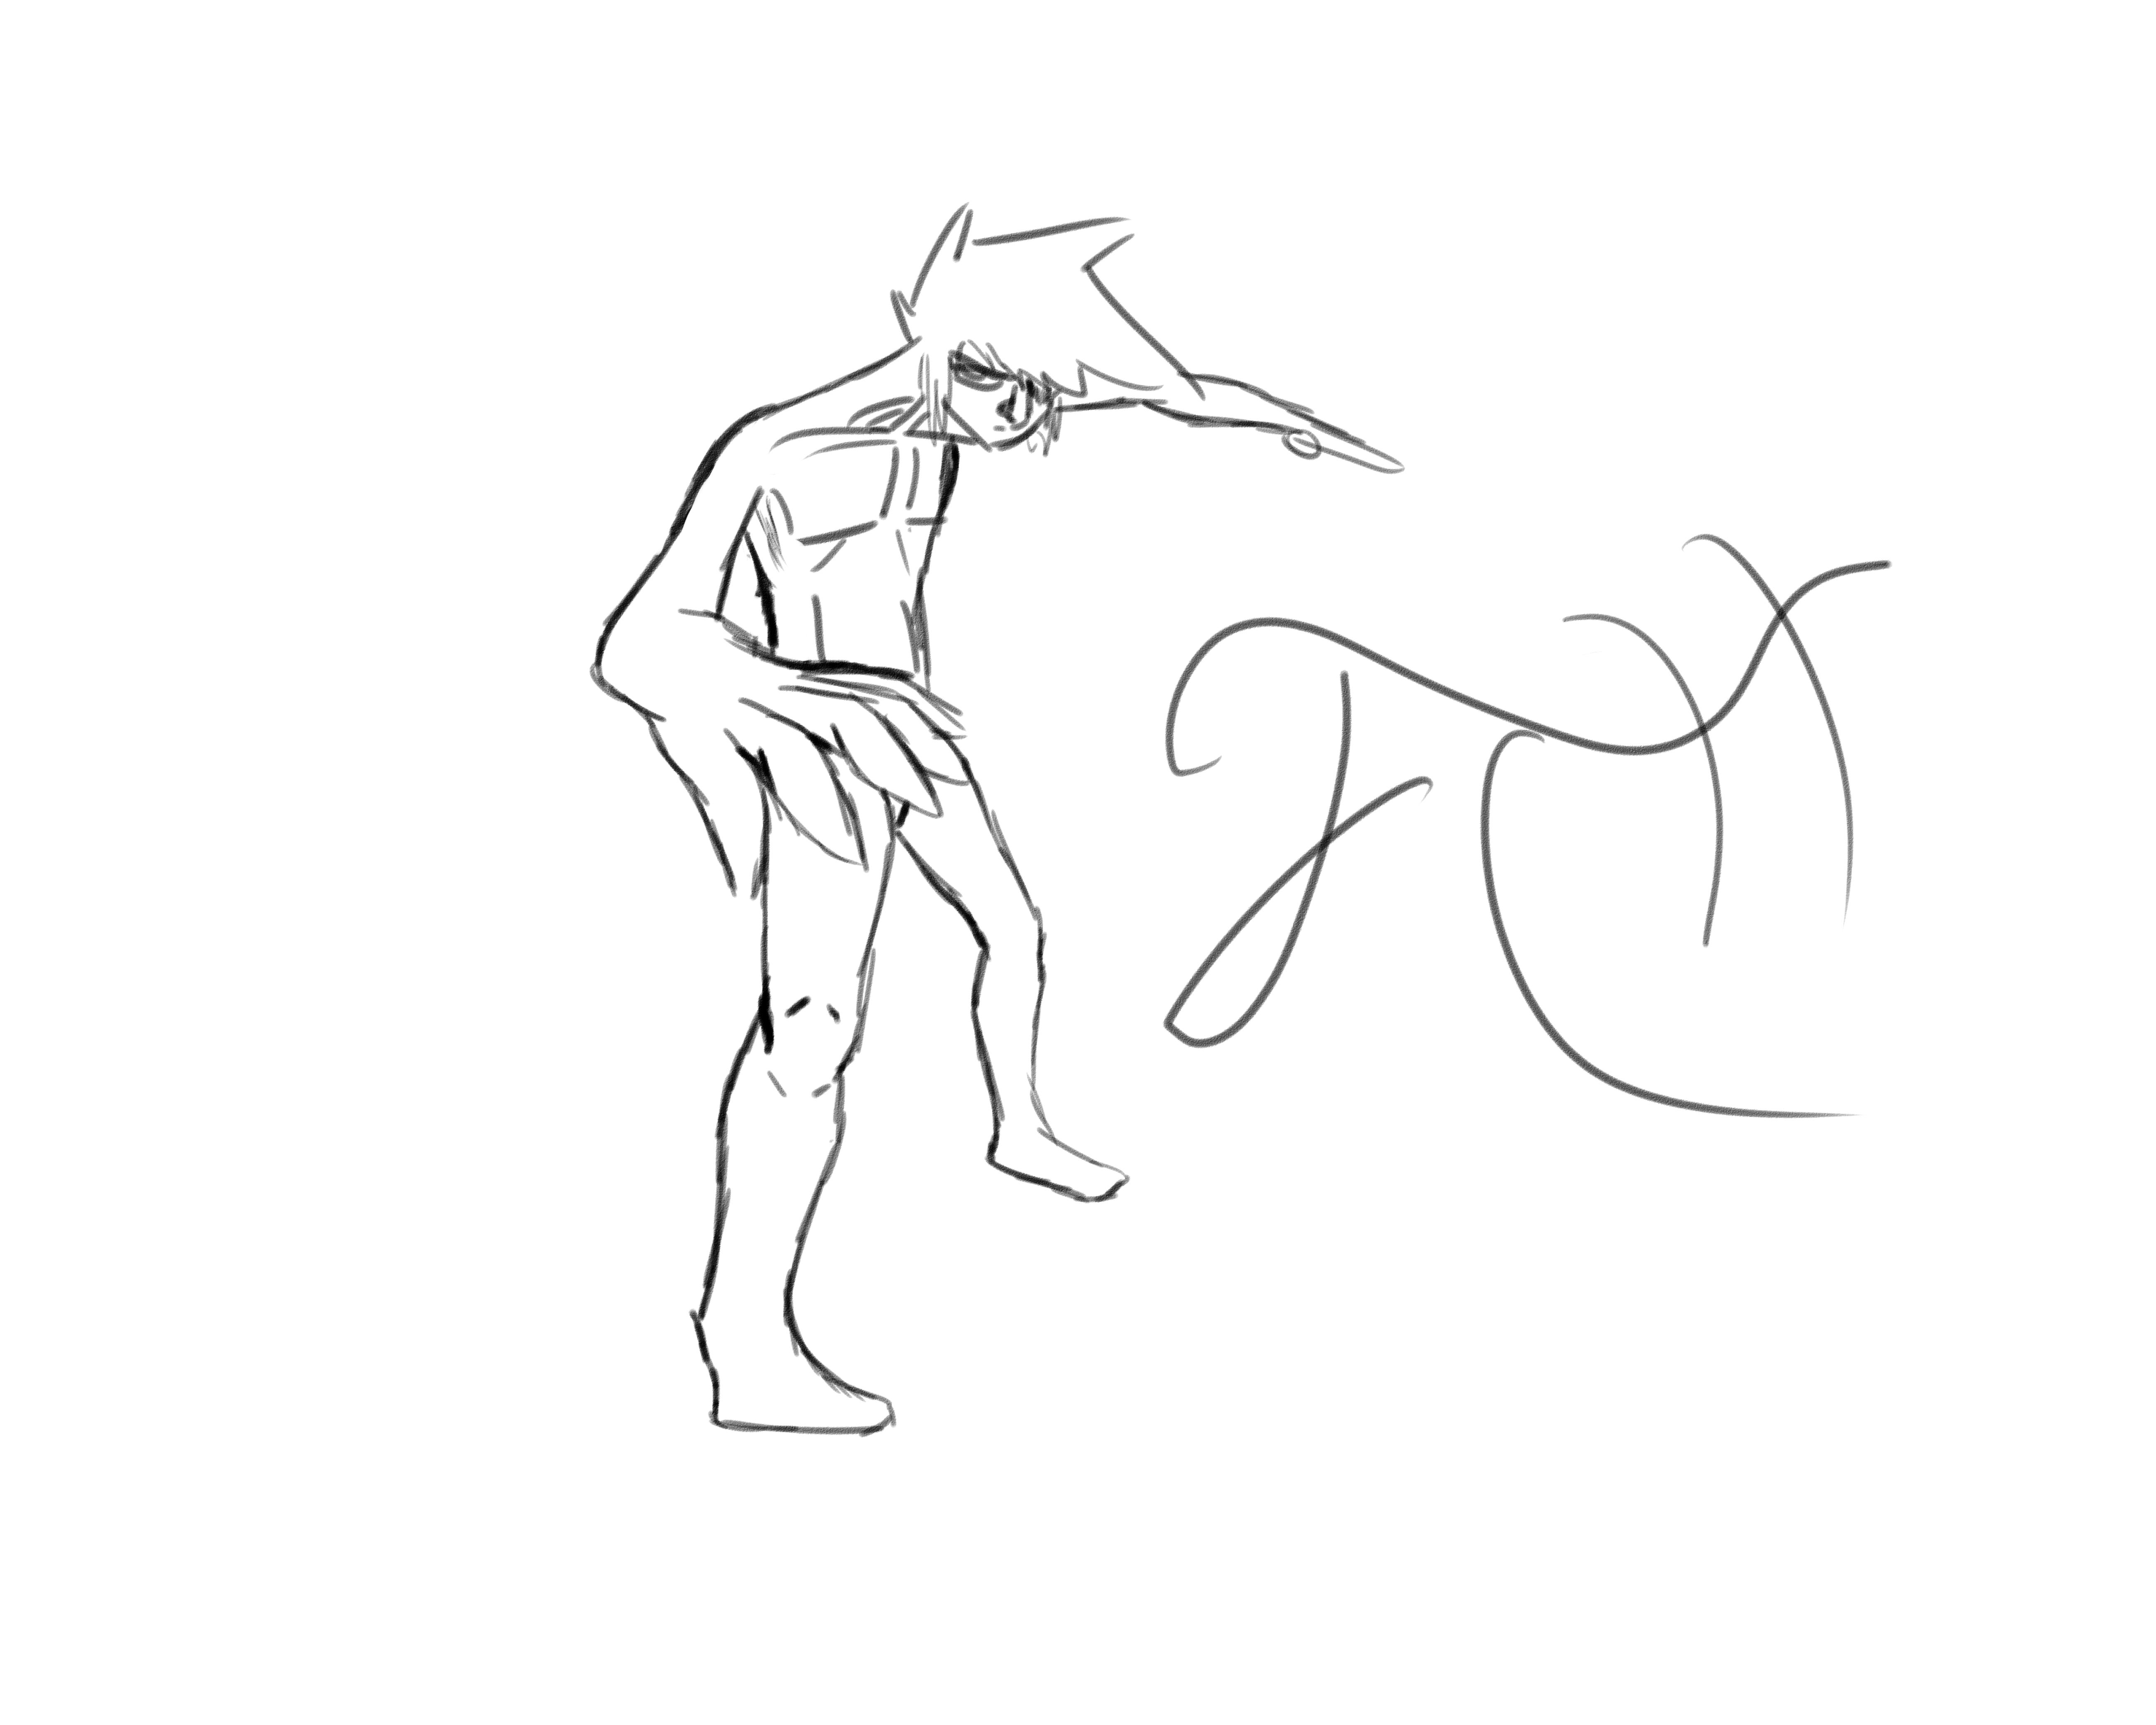 nude dude (pin up/anatomy practice)